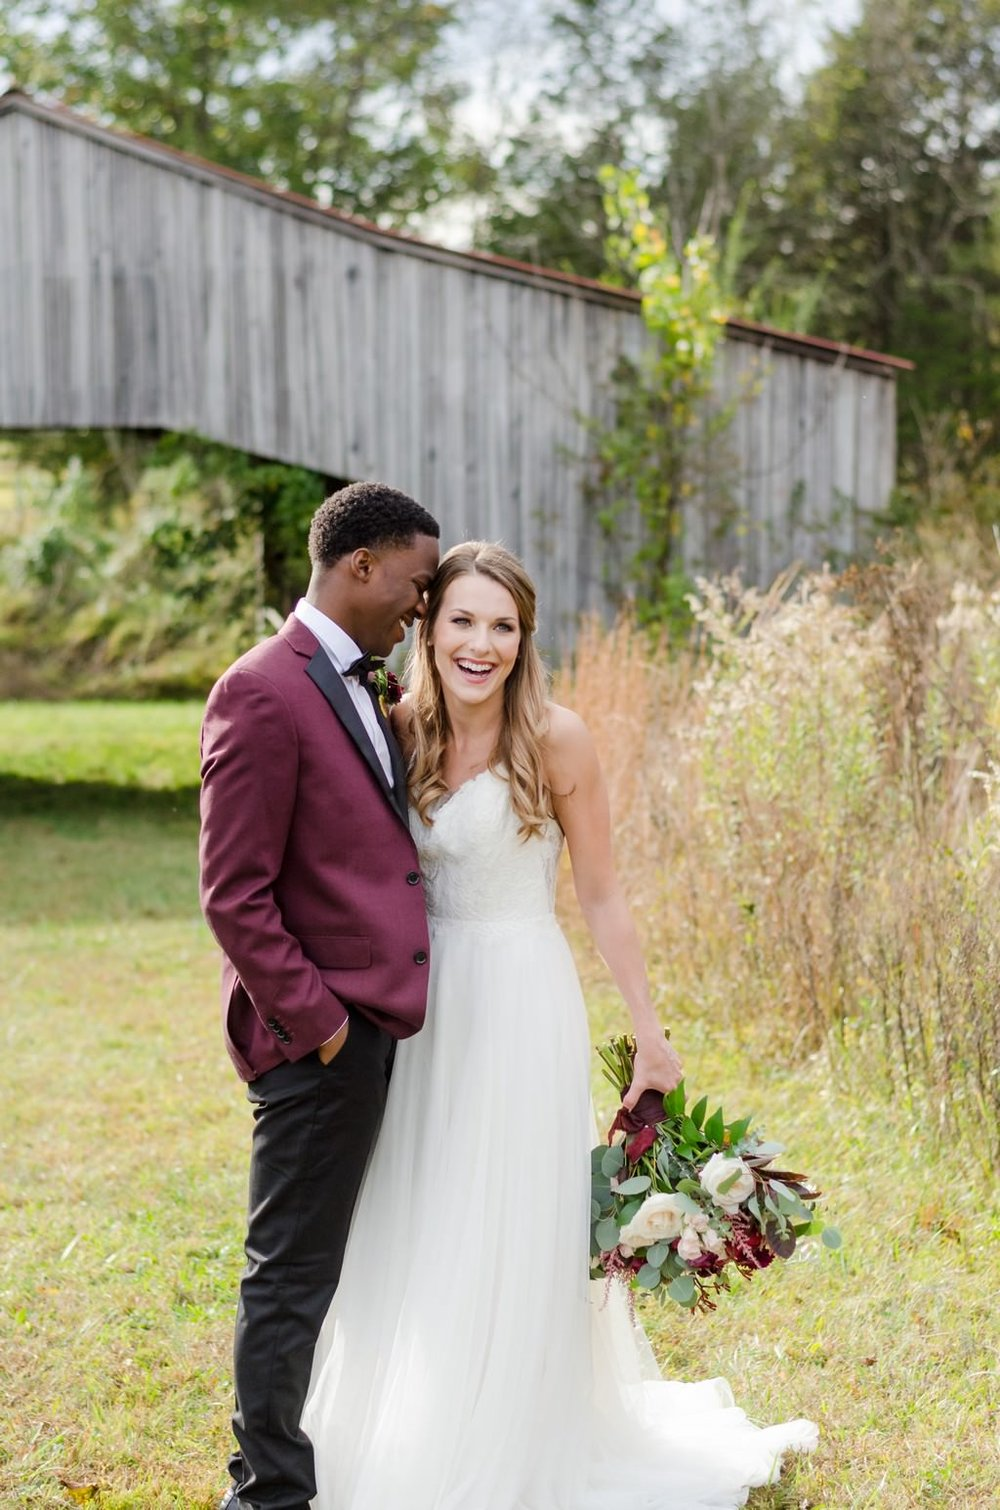 Iriswoods-Mt-Juliet-Blush-and-Burgundy-Nashville-Wedding-Photographer+9